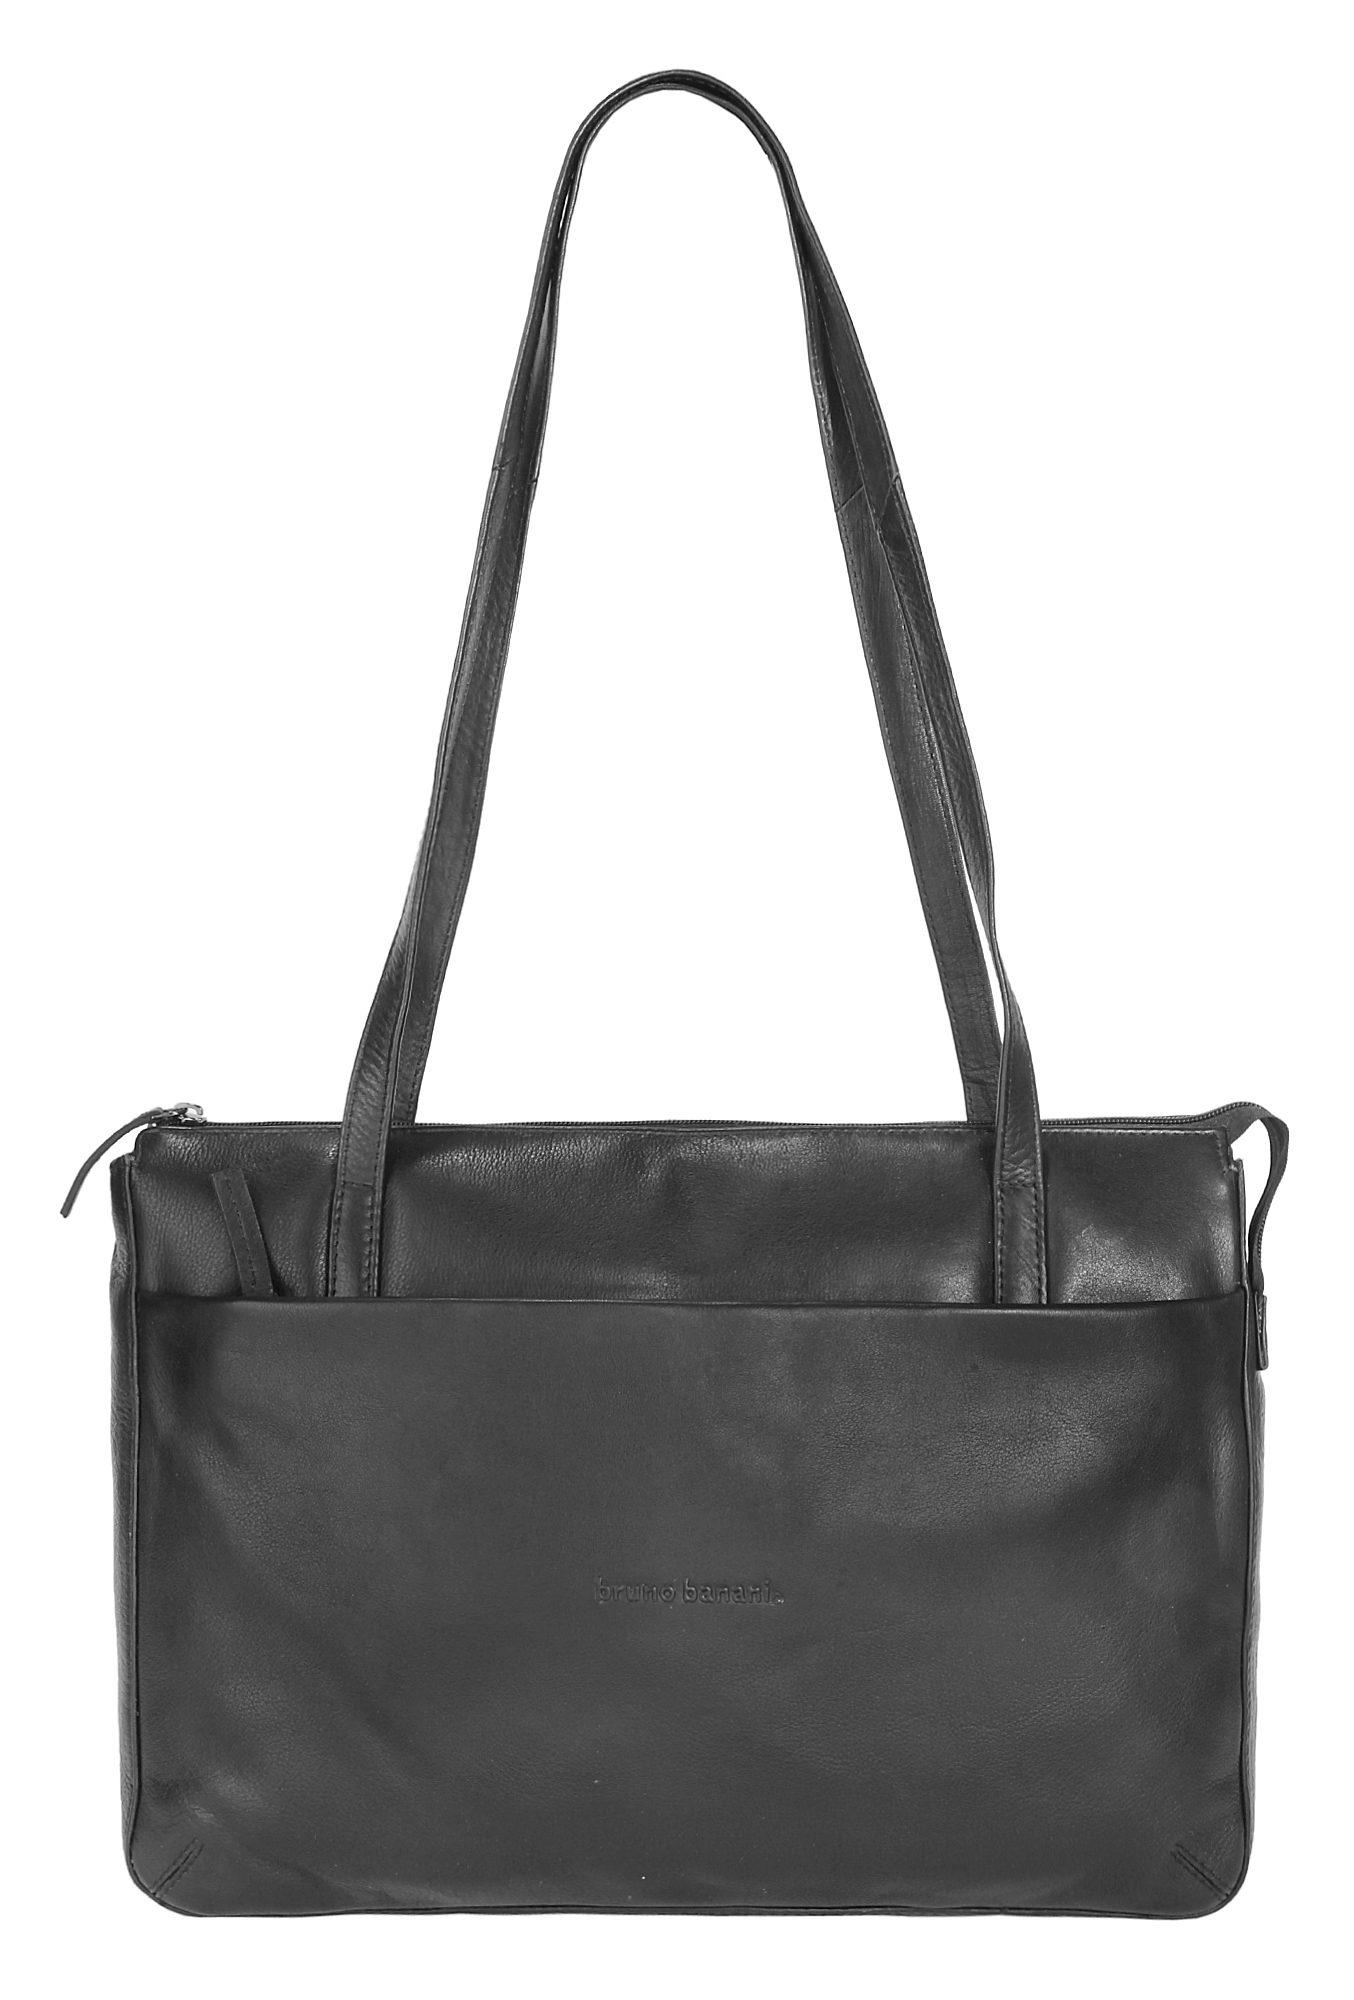 BRUNO BANANI Leder Damen Handtasche »Whisper«